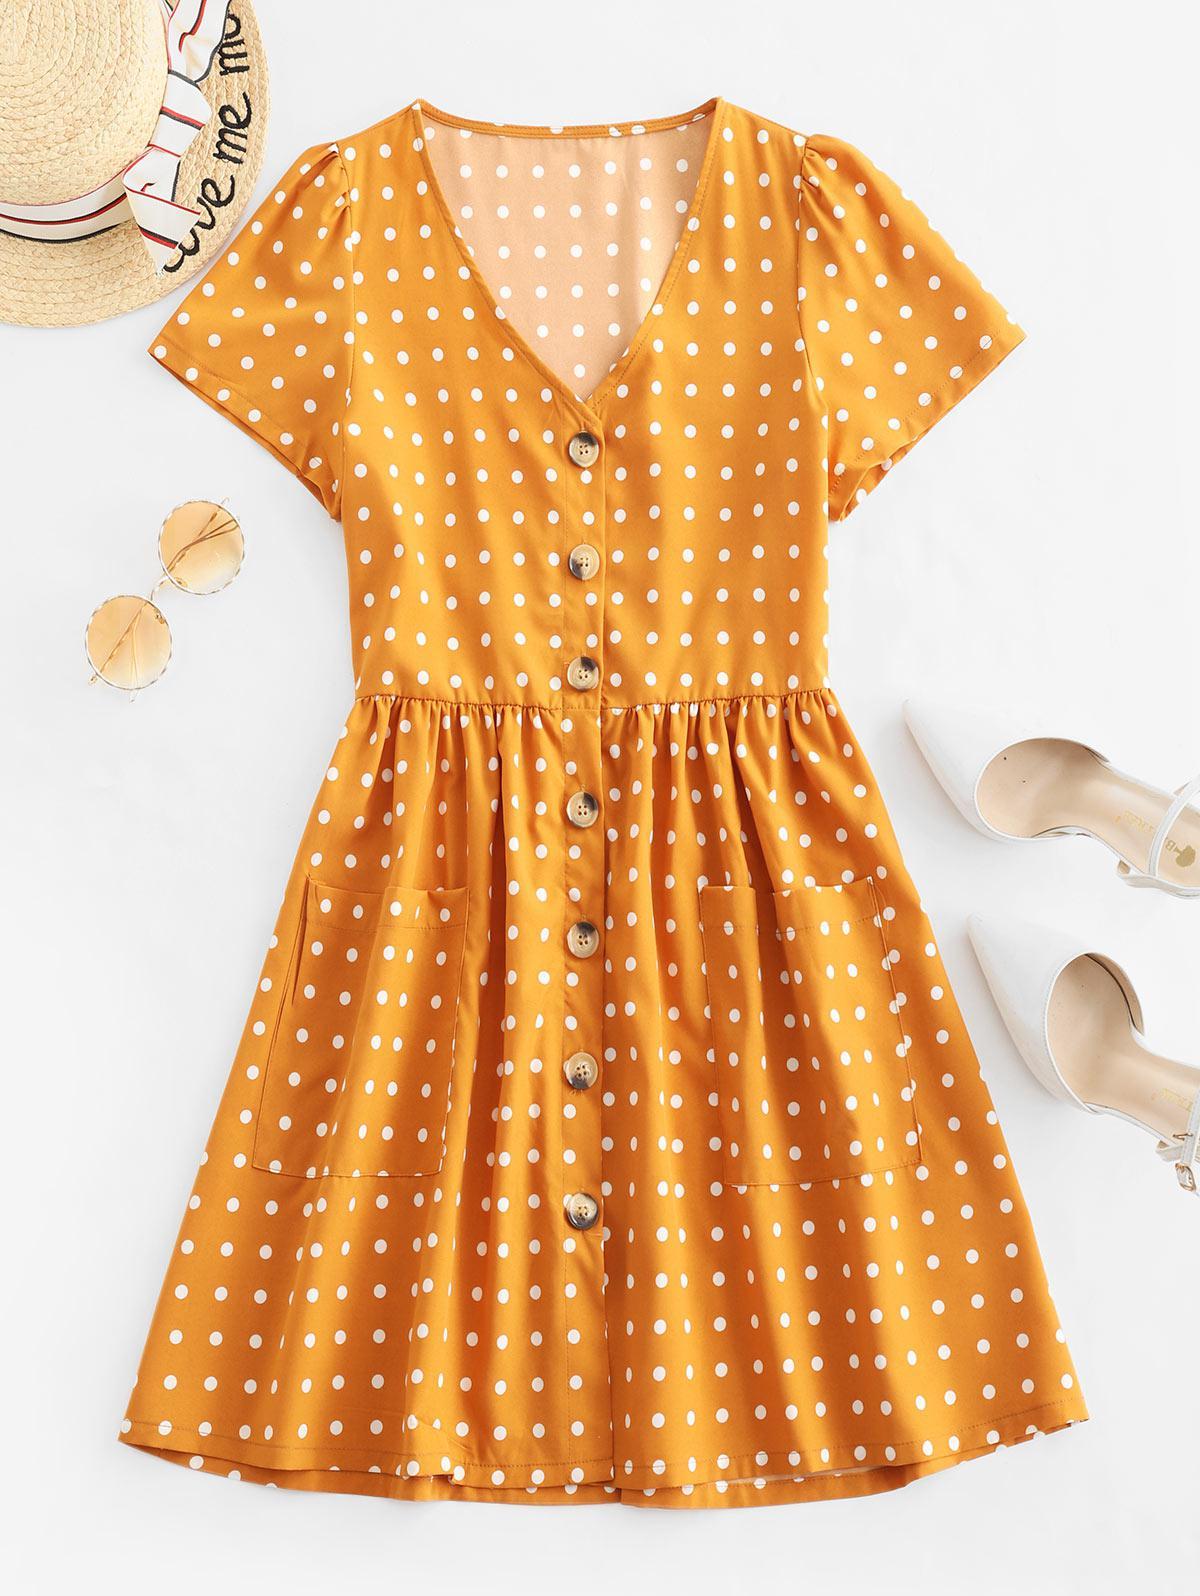 Polka Dot Pulsante Tasca A V Neck Dress